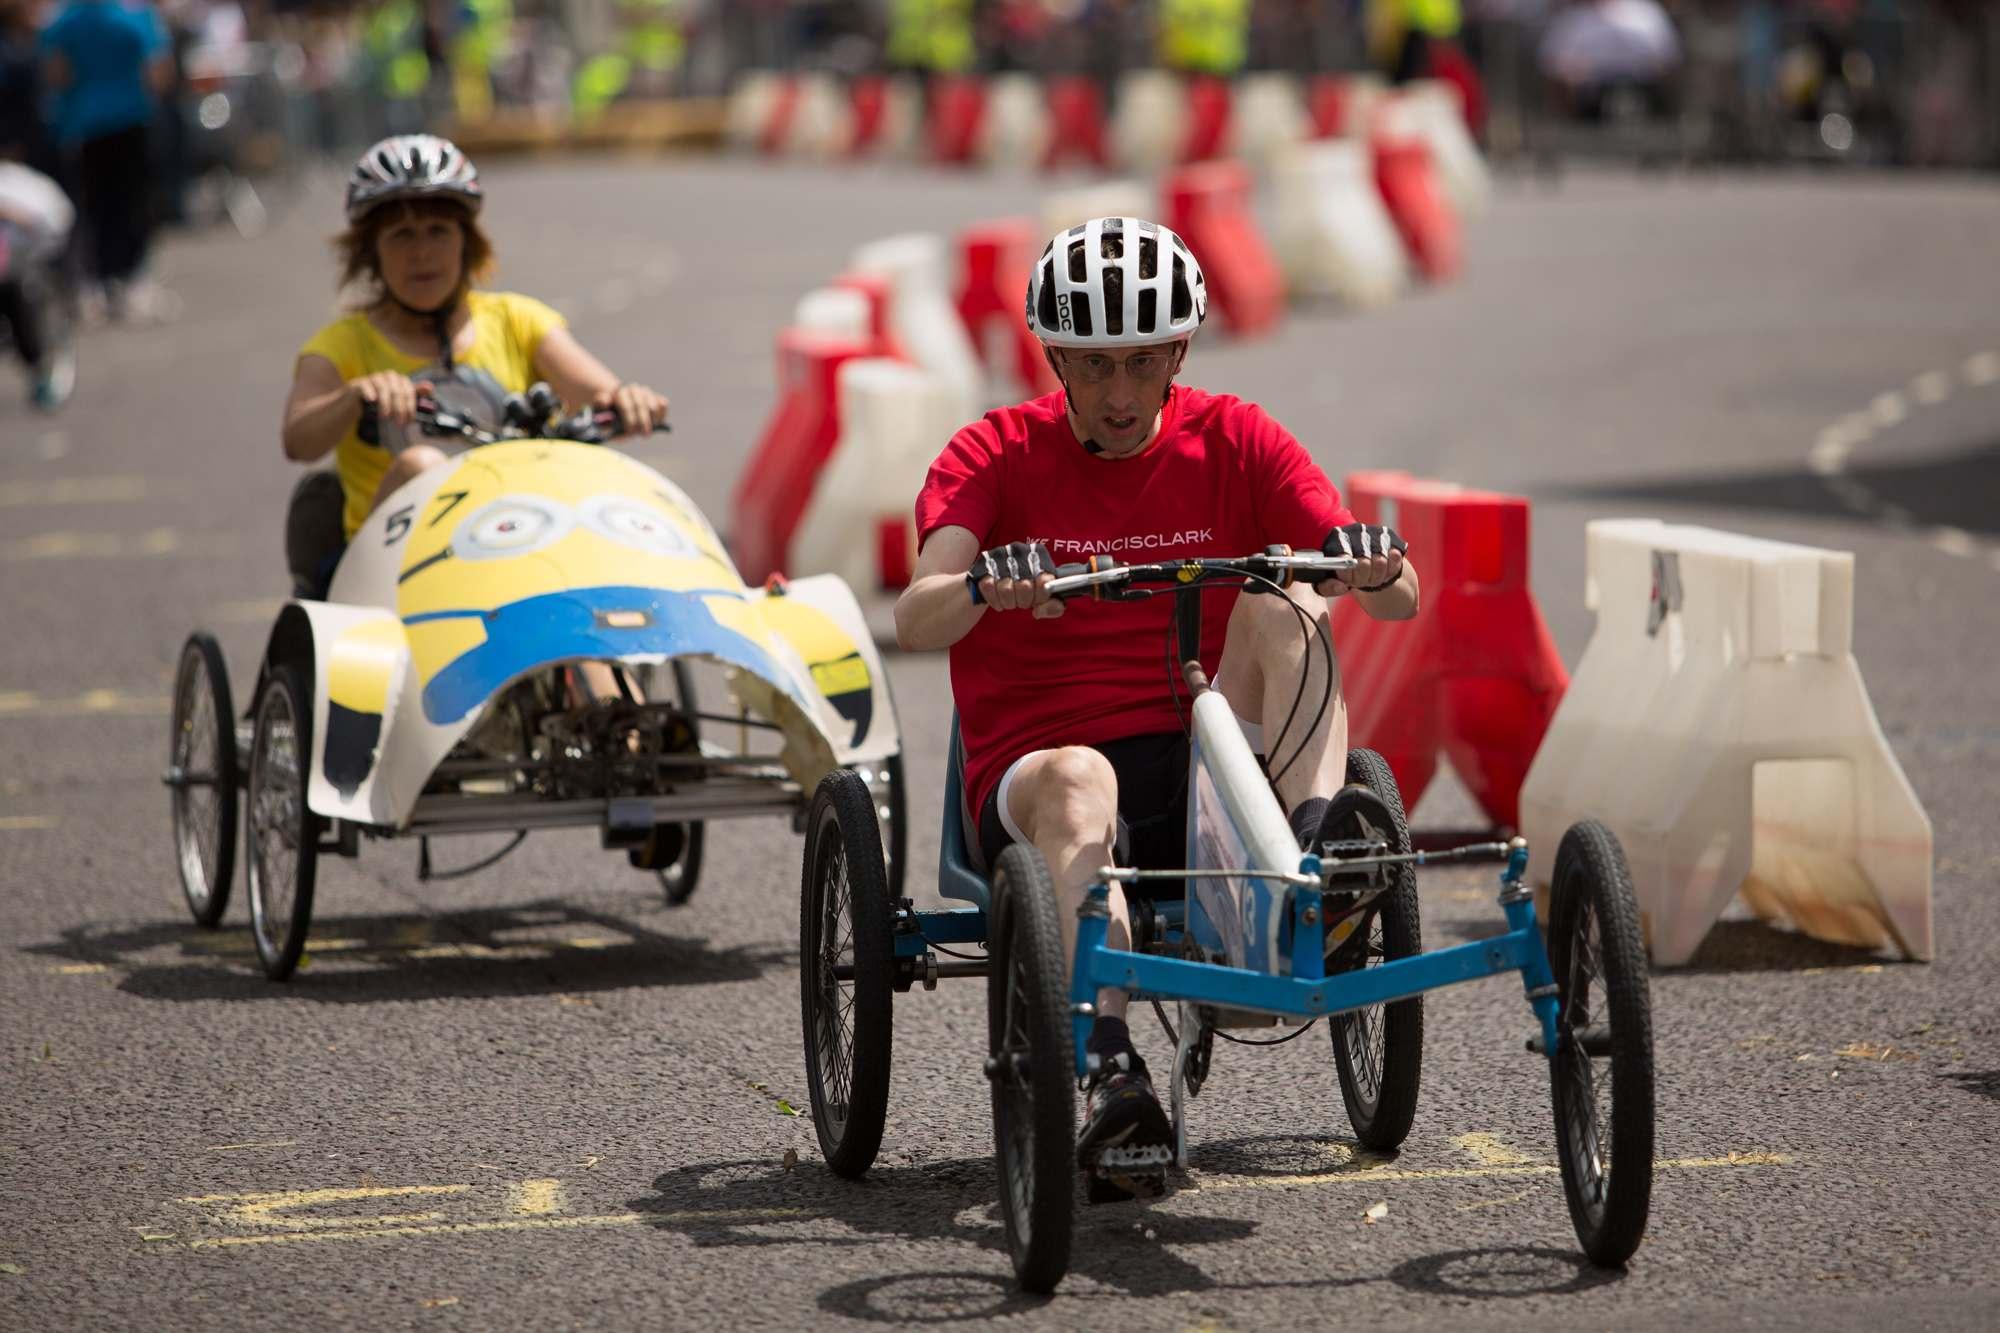 pedal car grand prix13 British Ringwood Pedal Car Grand Prix 2016